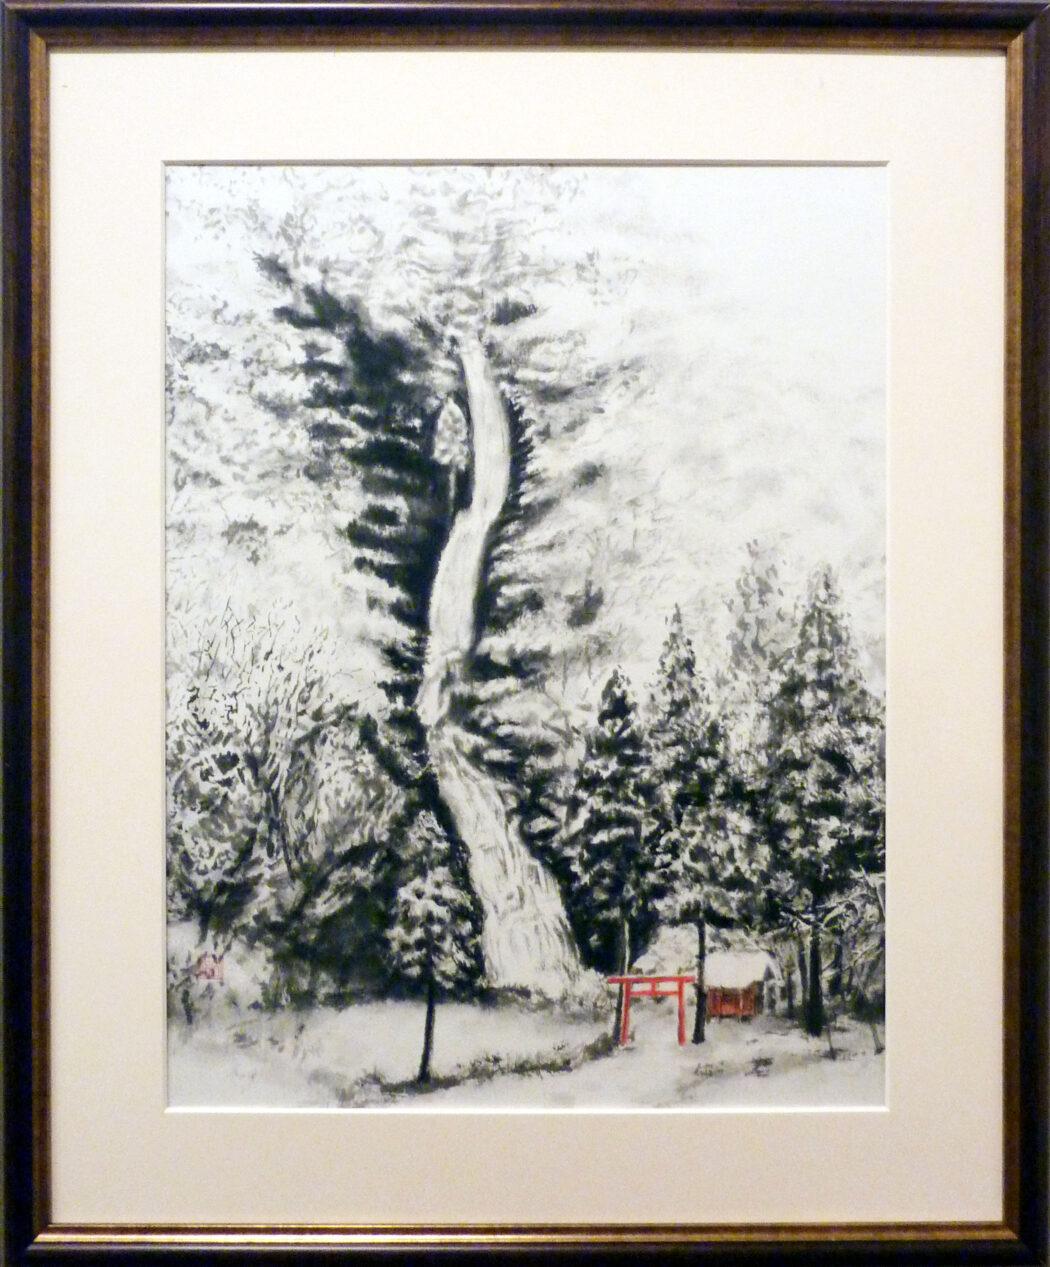 35 河原公治 白糸の滝